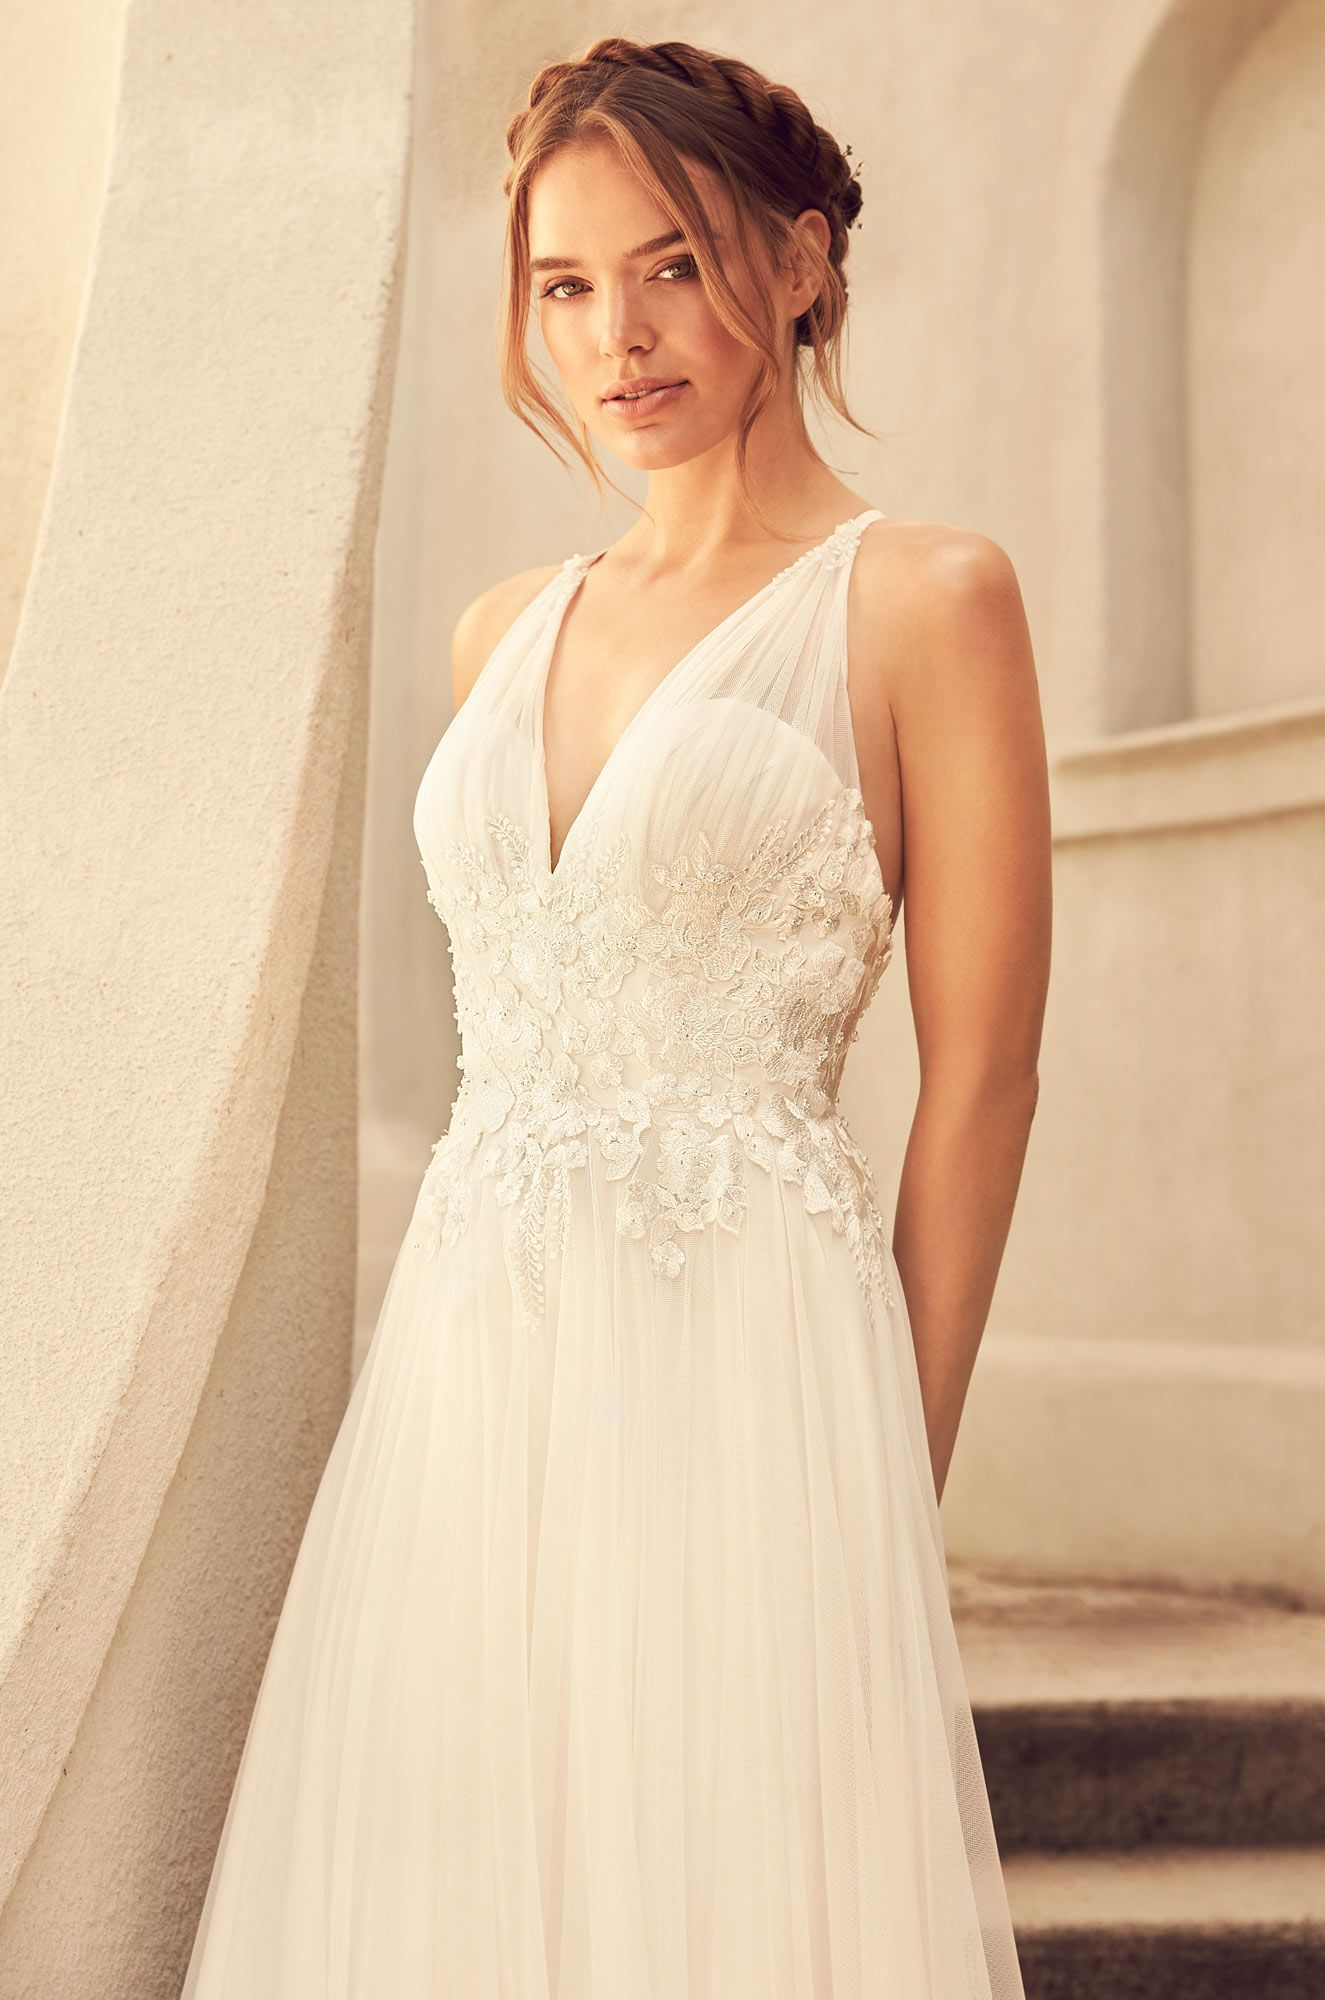 Gathered Tulle Skirt Wedding Dress Style 4782 Wedding Dresses